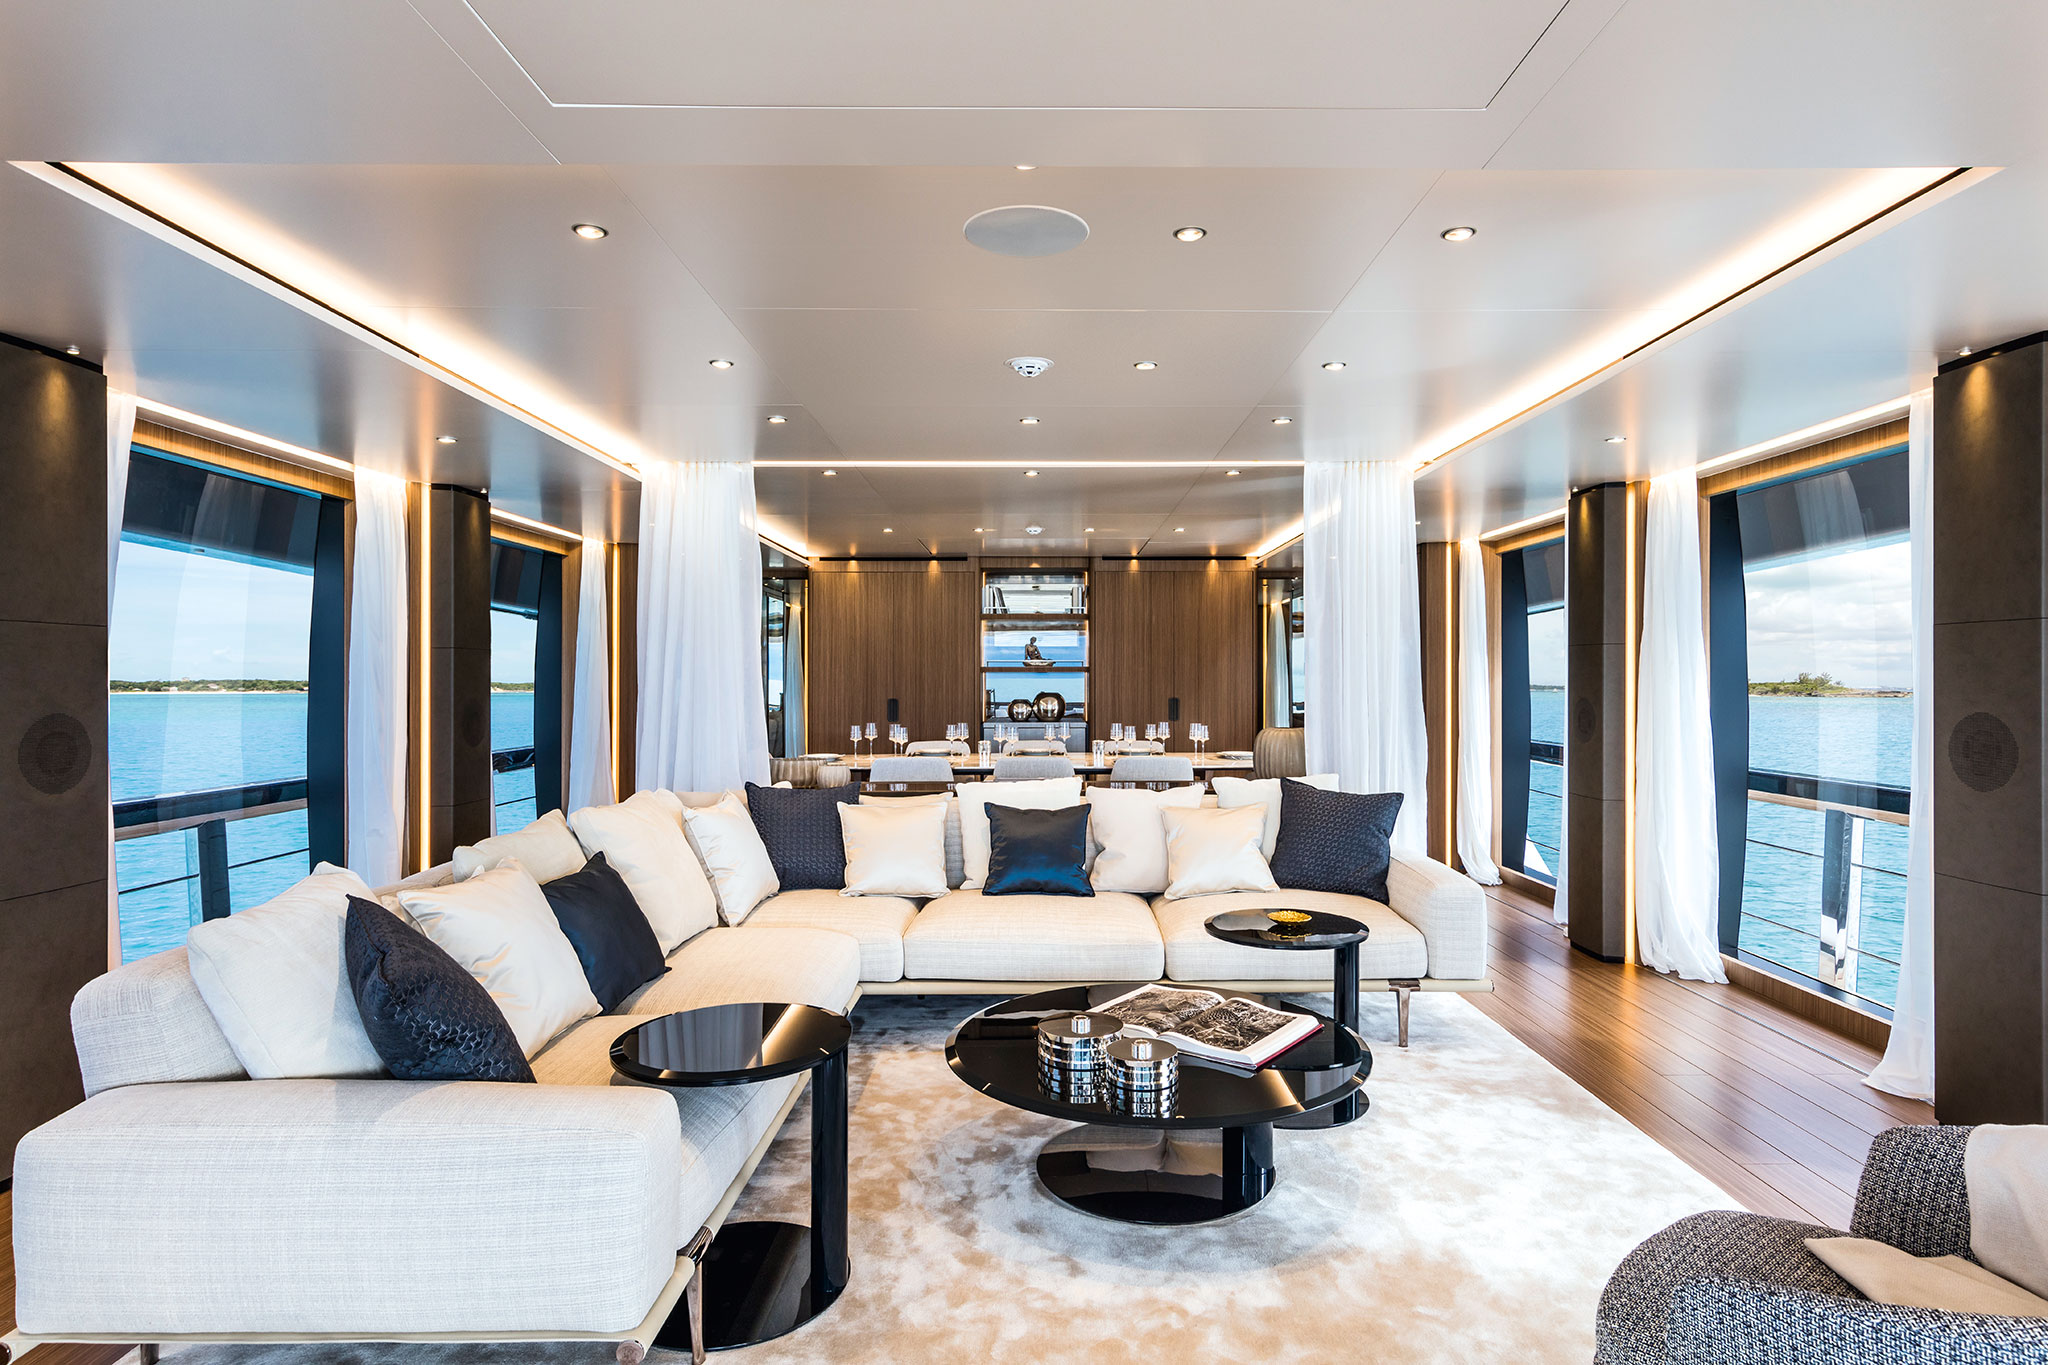 essai-Custom-line-120-yachts-france-170-01-281-corr3